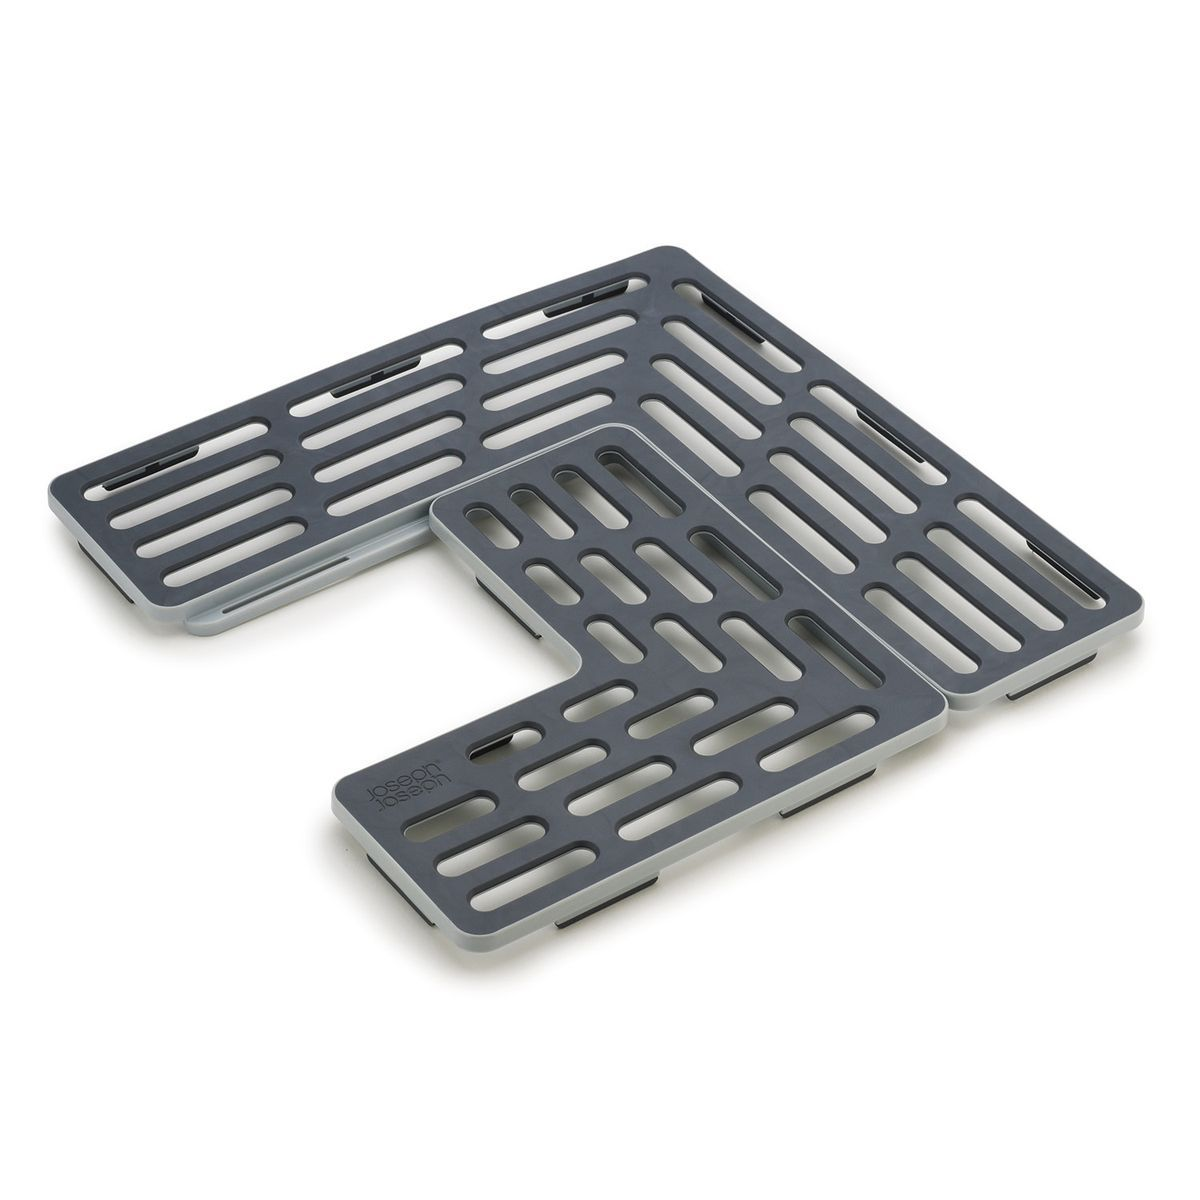 подложки для раковины proffi решетка для раковины галька пвх 32 26 см Подложка для раковины Joseph Joseph SinkSaver, цвет: серый, белый